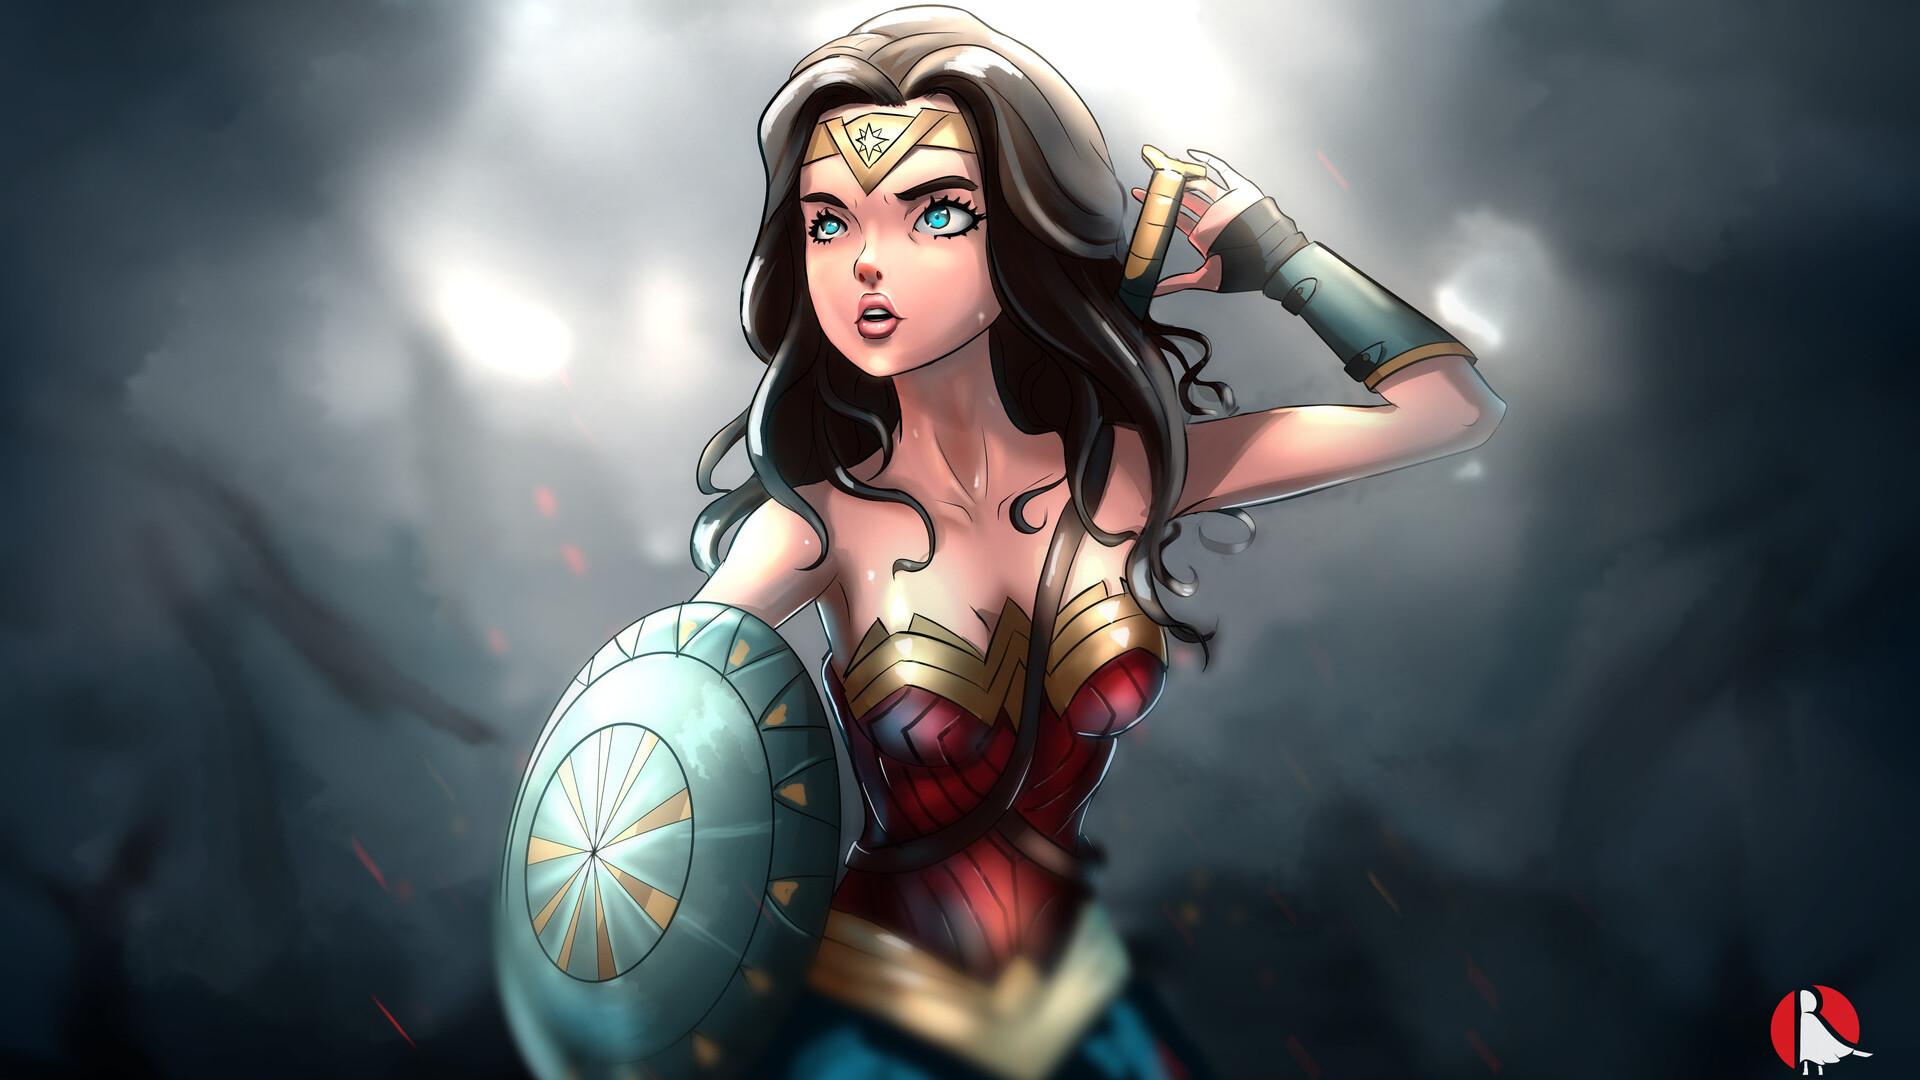 1920x1080 Wonder Woman Cartoon Artwork Laptop Full HD ...